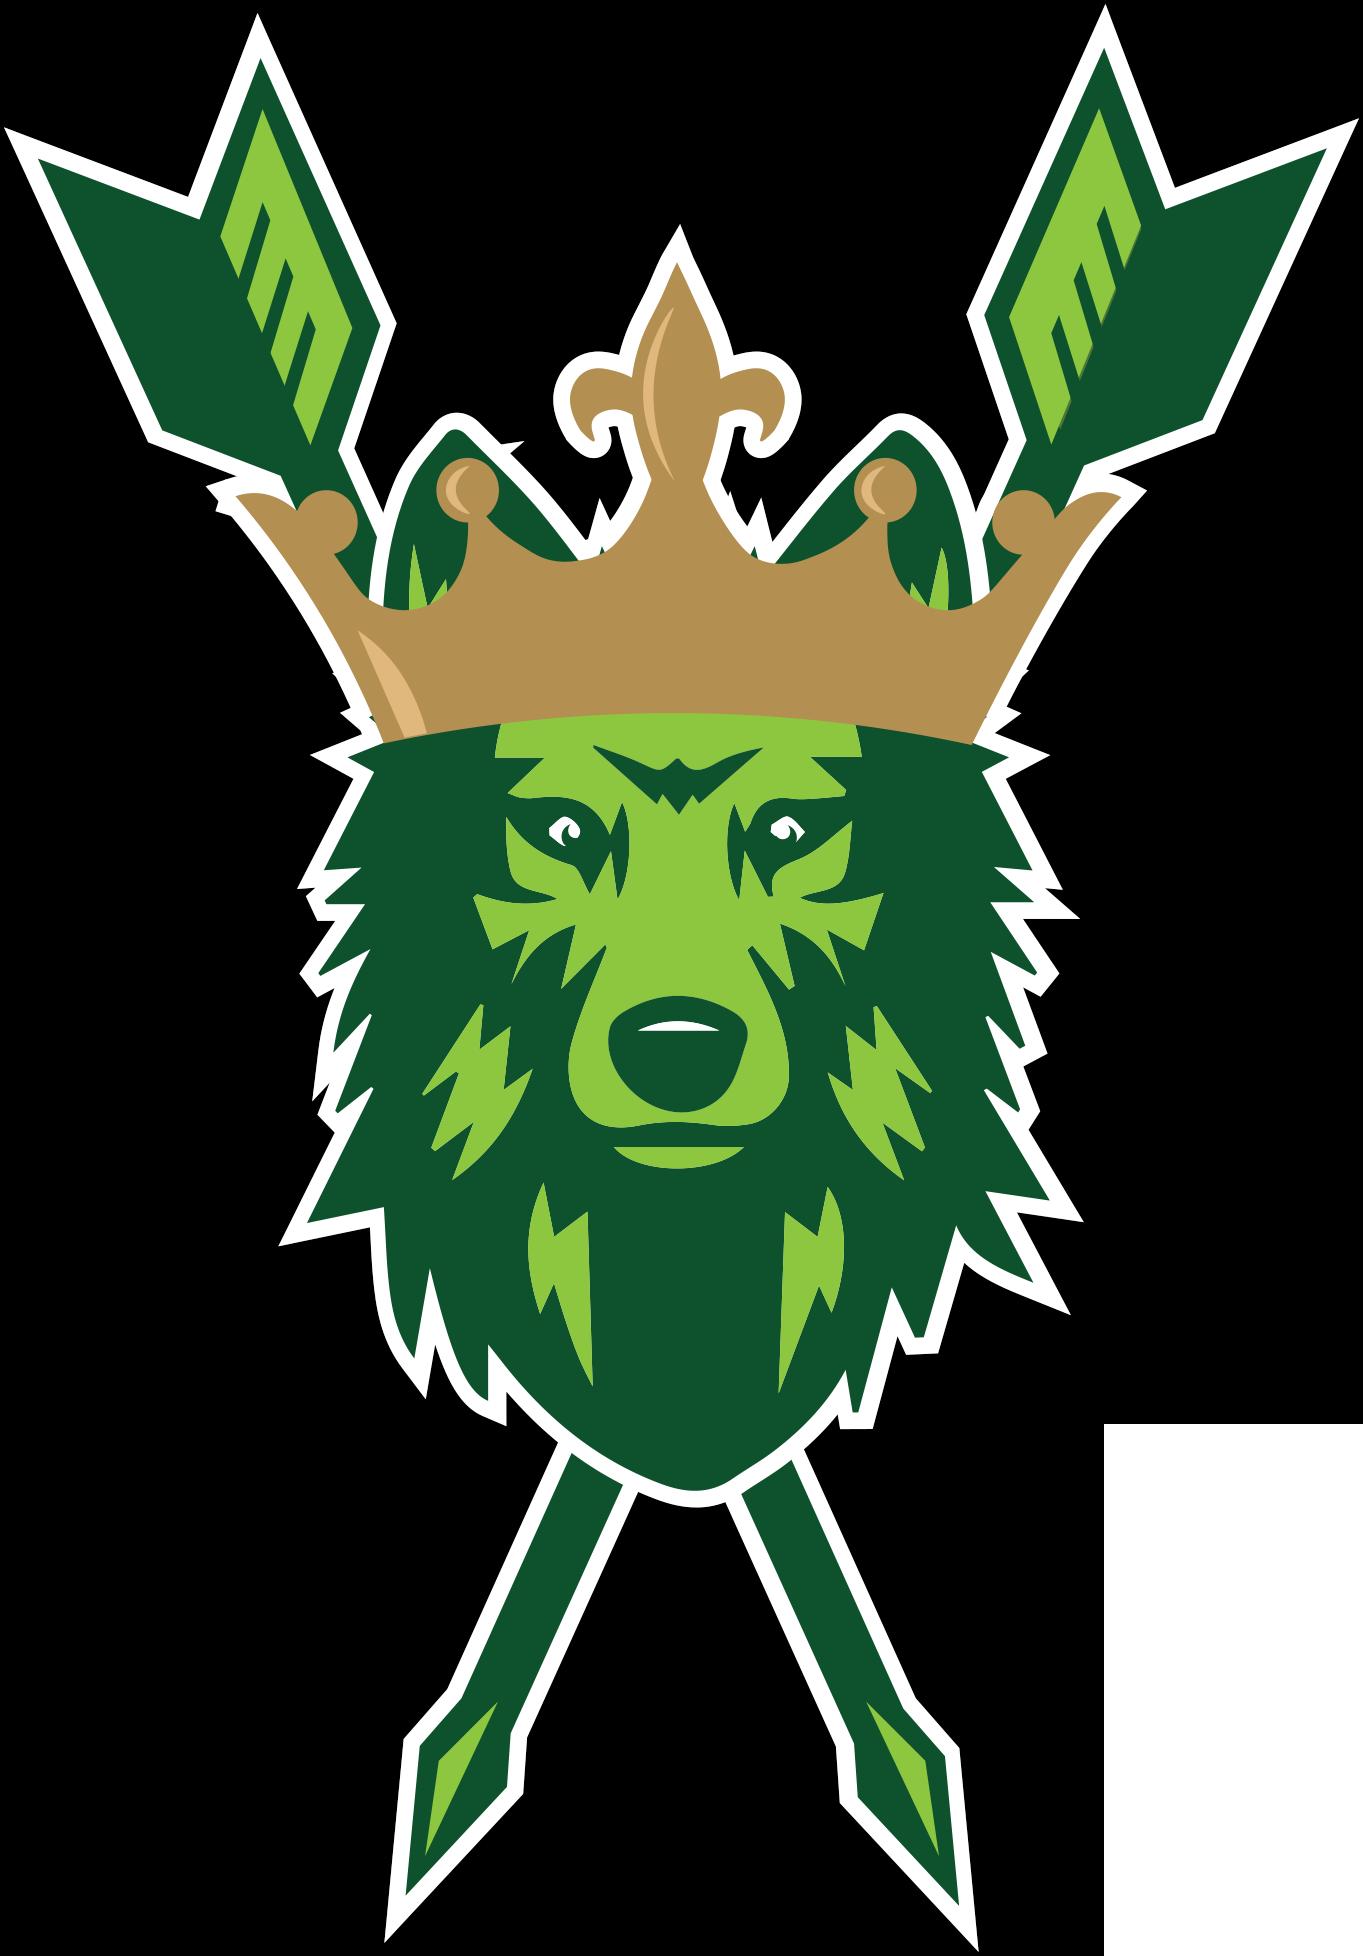 Saints football logo clipart banner download PLAYER ROSTER - burysaints banner download